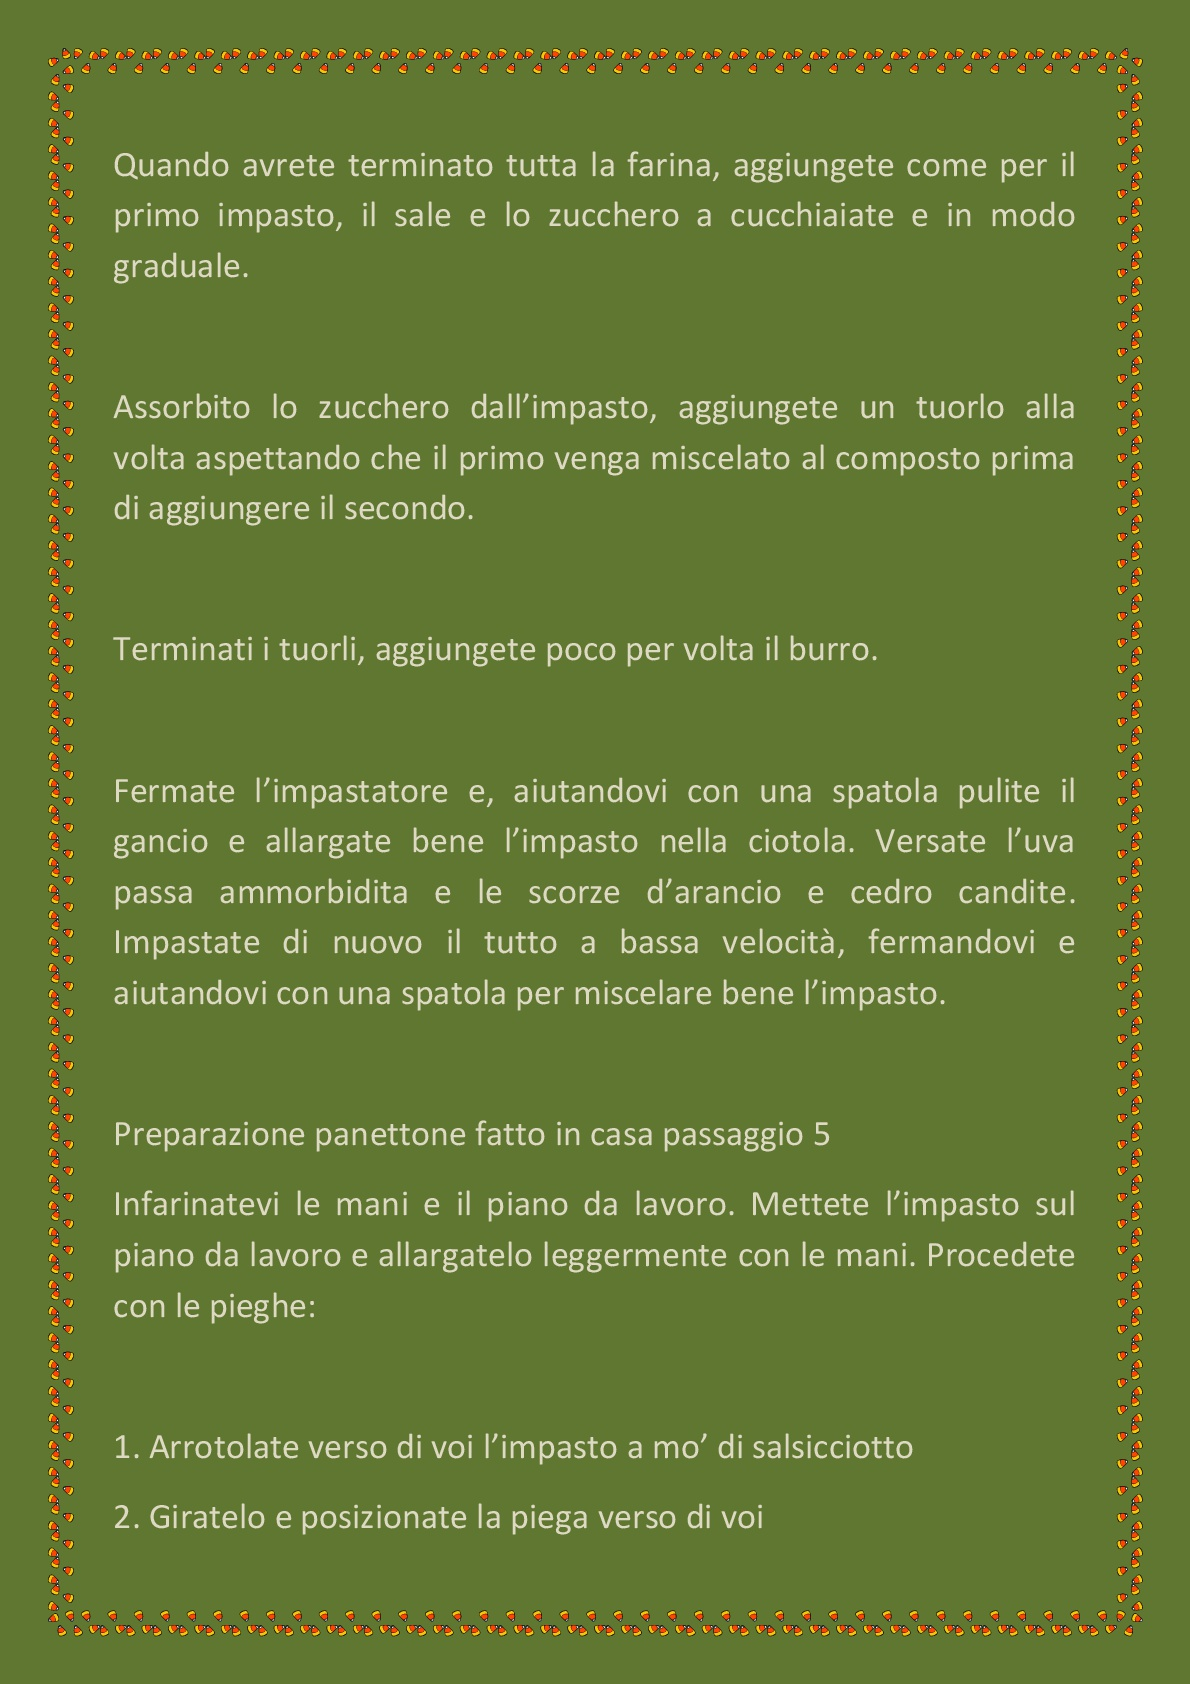 IL-RICETTARIO-(1)-006